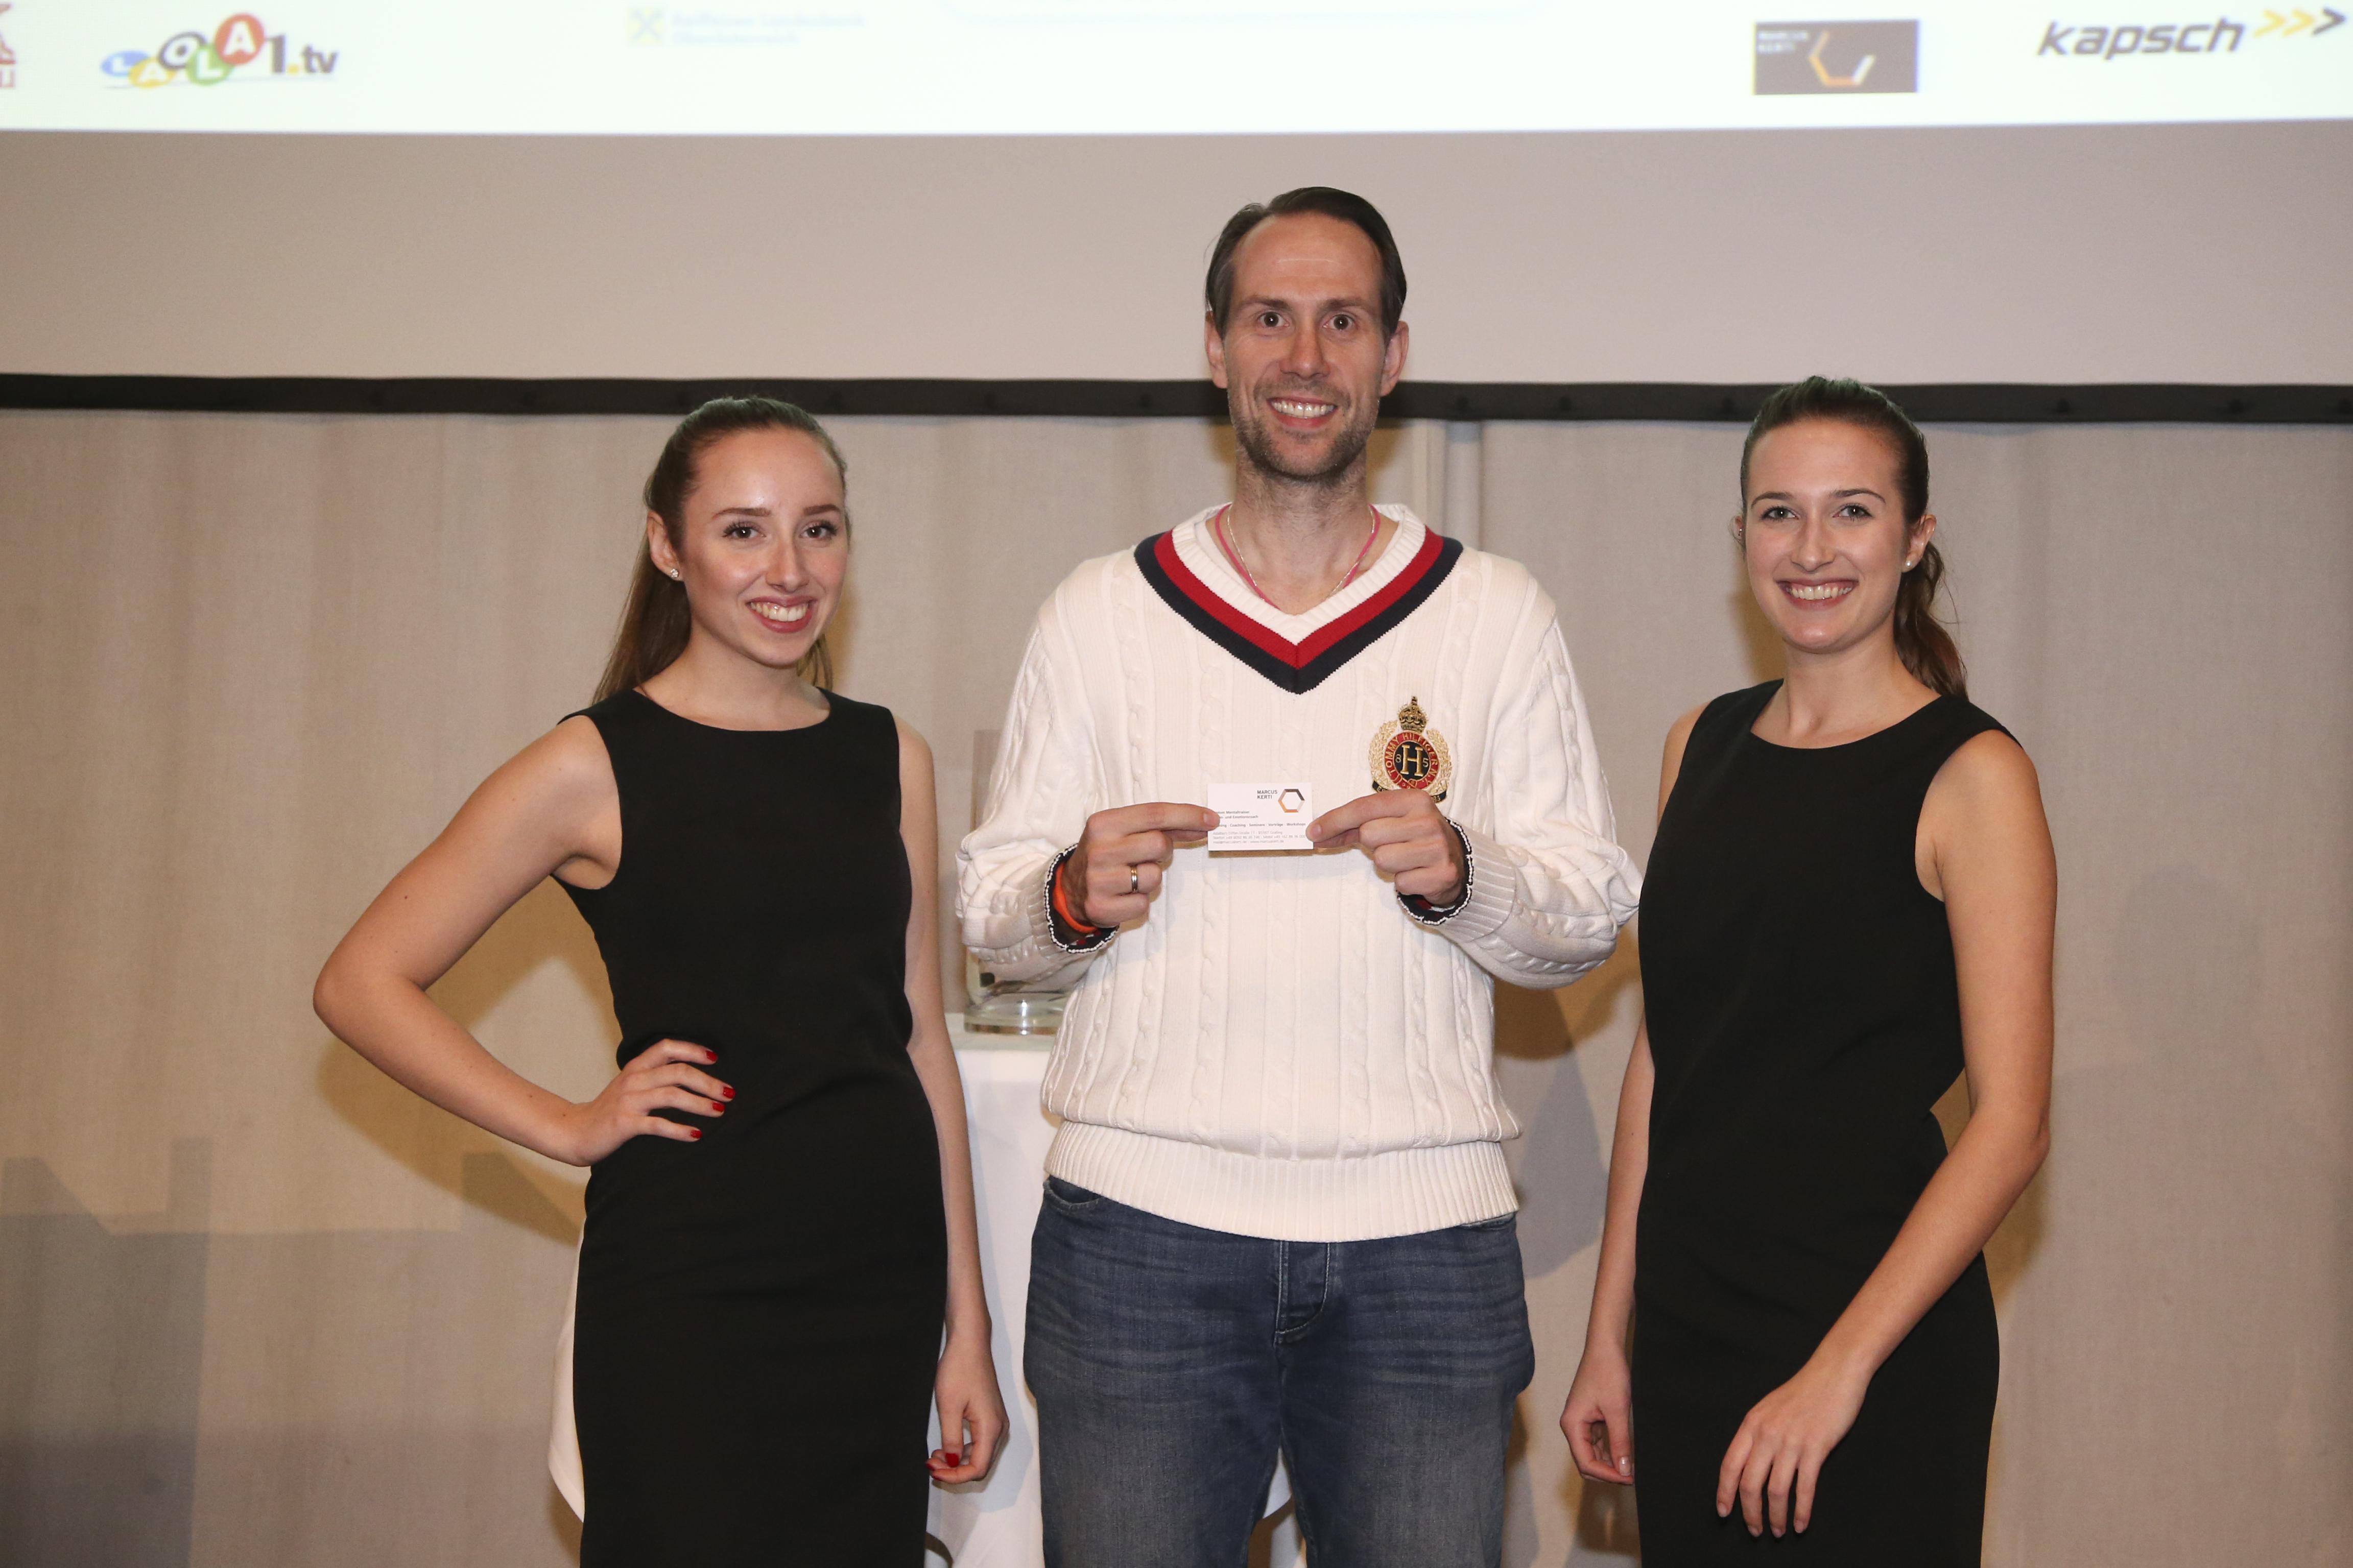 spusu HLA Gewinnspiel - spusu HLA Branchentreff 3.0. in Vorarlberg mit cinnamon Hospitatlity & Promotion - Fotocredit: Alexandra Köss